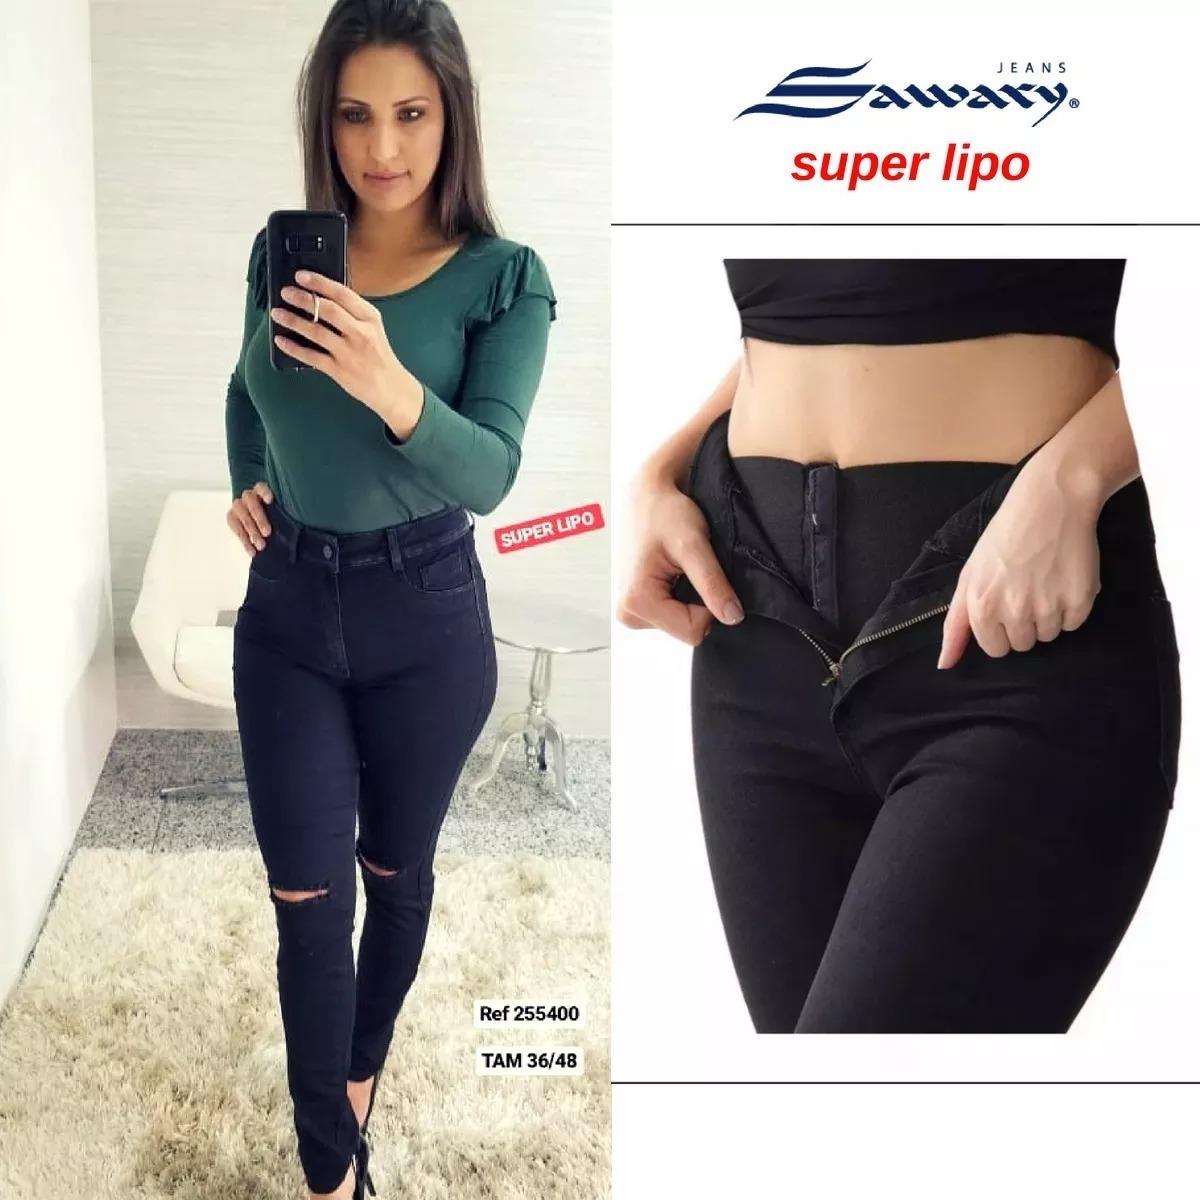 05ea40aea calça jeans sawary legging super lipo preta cintura alta. Carregando zoom.